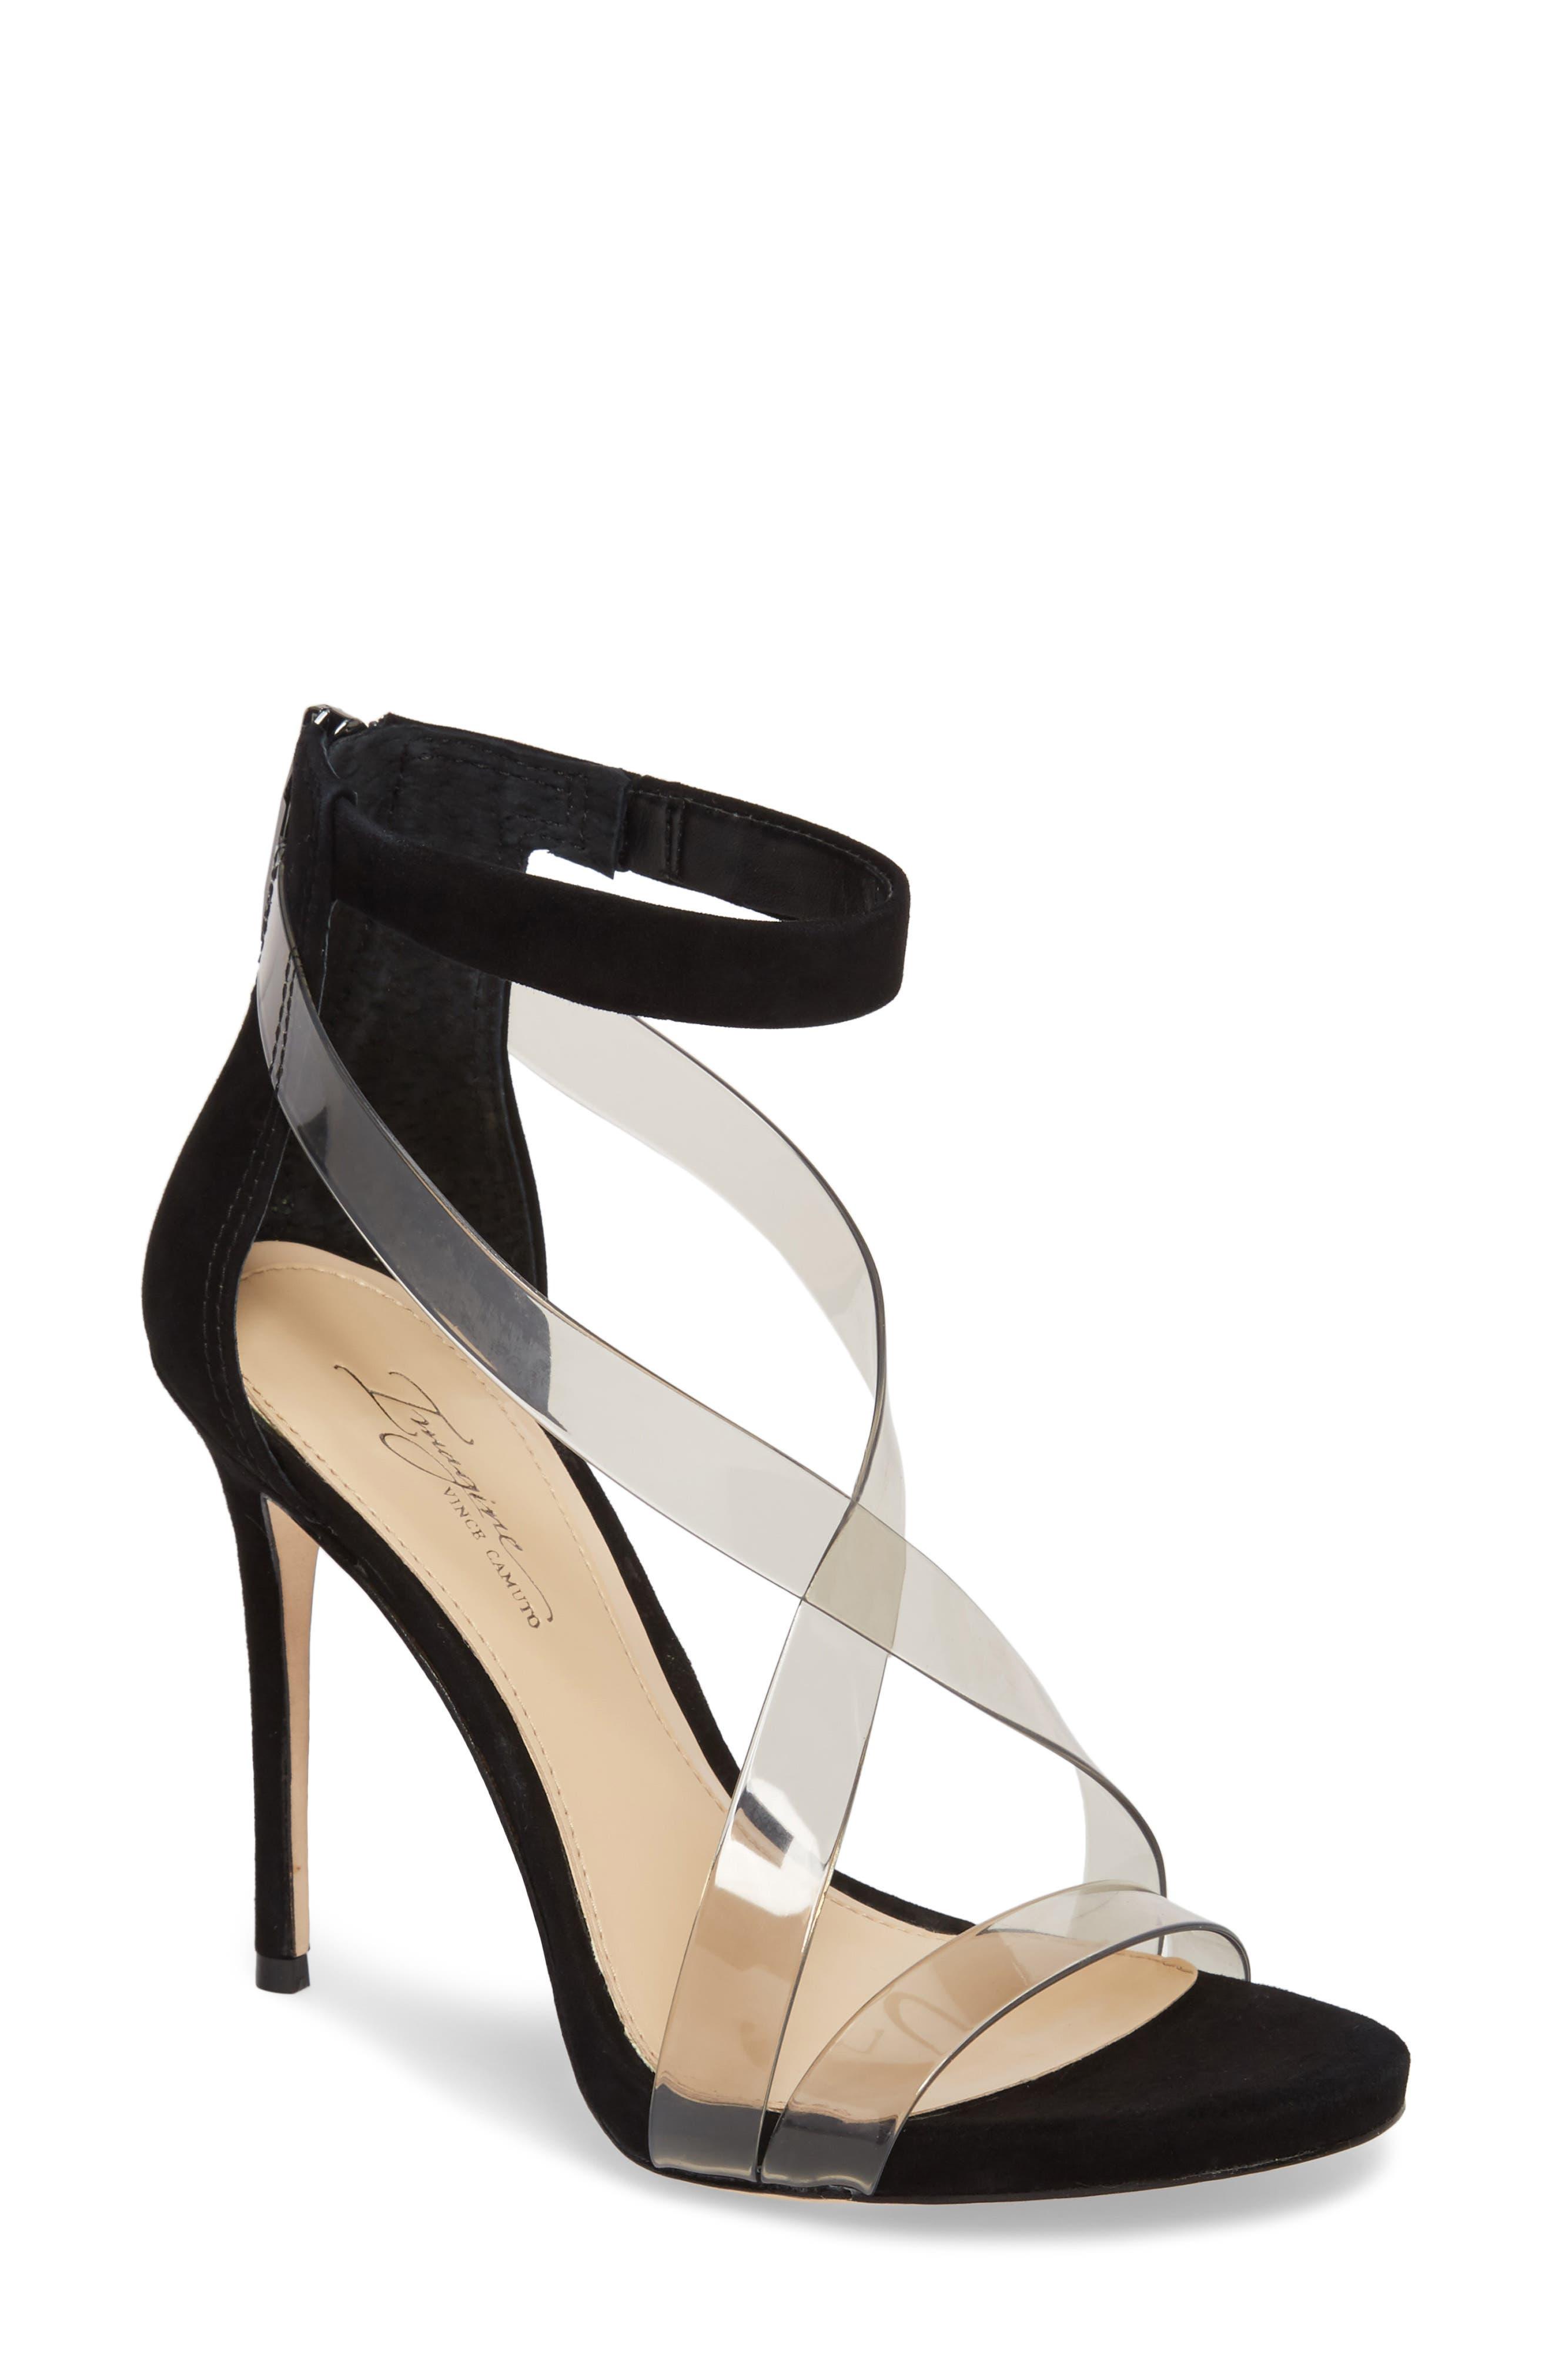 Main Image - Imagine Vince Camuto 'Devin' Sandal (Women)